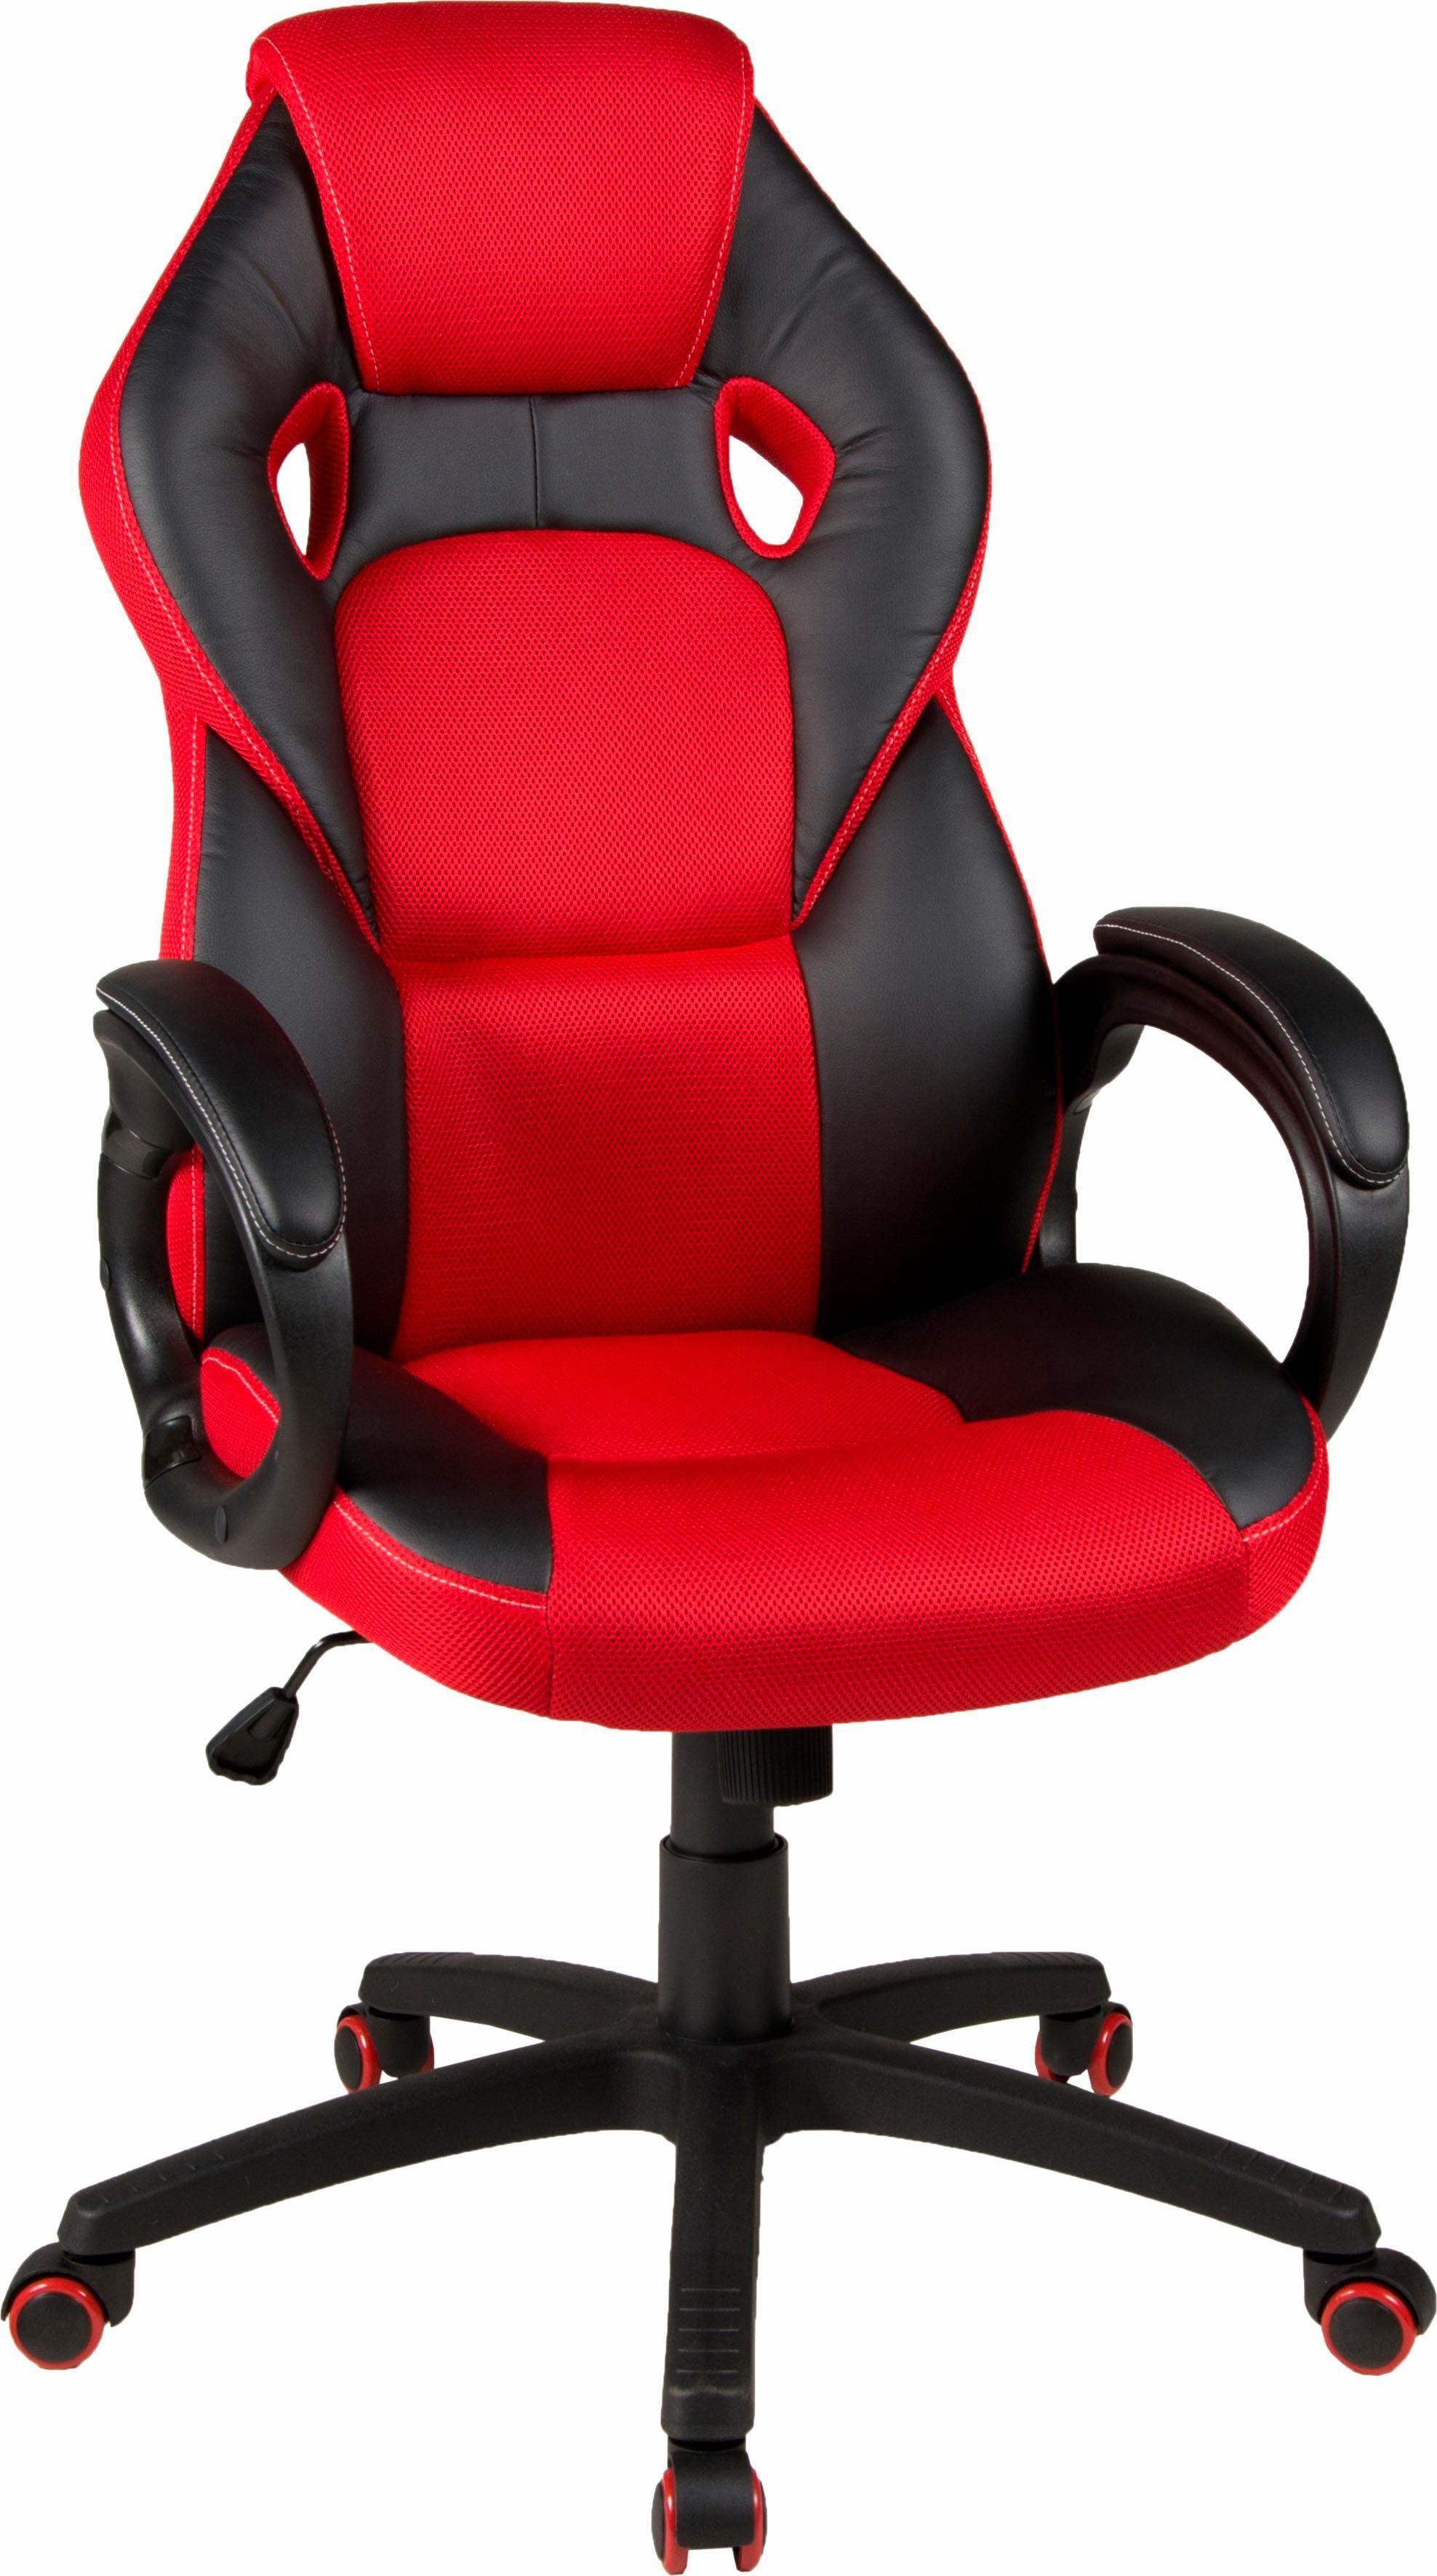 Duo Online Collection »samu«Mit Modernem KaufenOtto Gaming Chair Netzstoffbezug Yb6yf7g